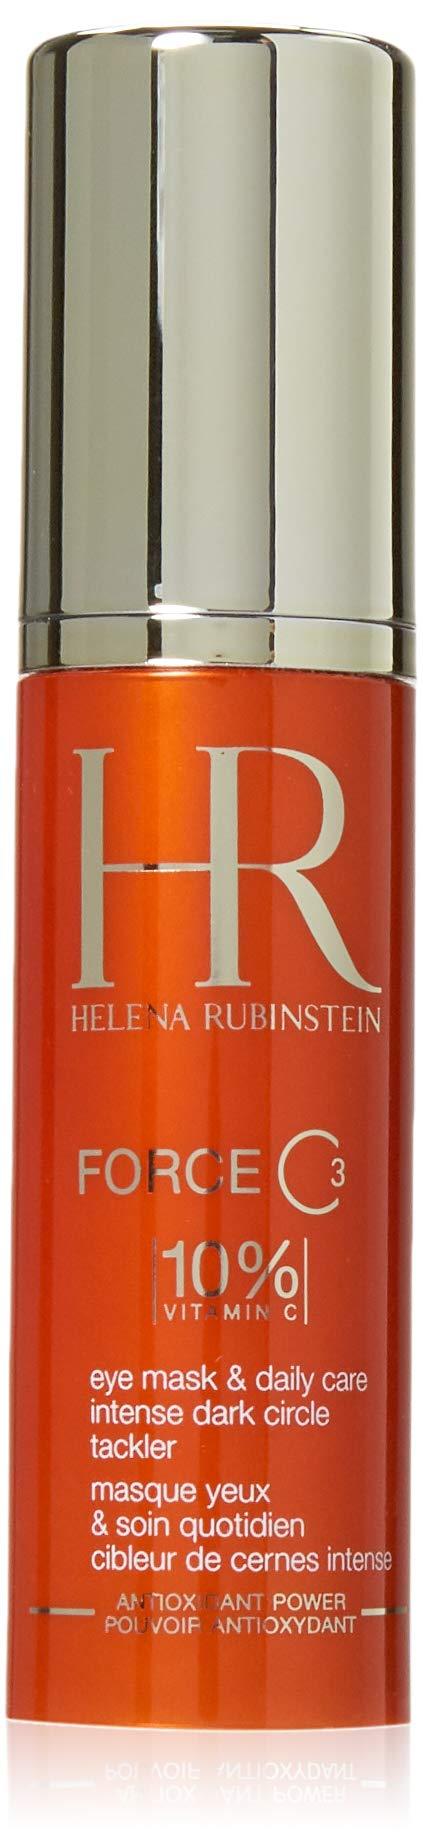 Helena Rubinstein Force C Eye Mask and Daily Care, 0.5 Ounce